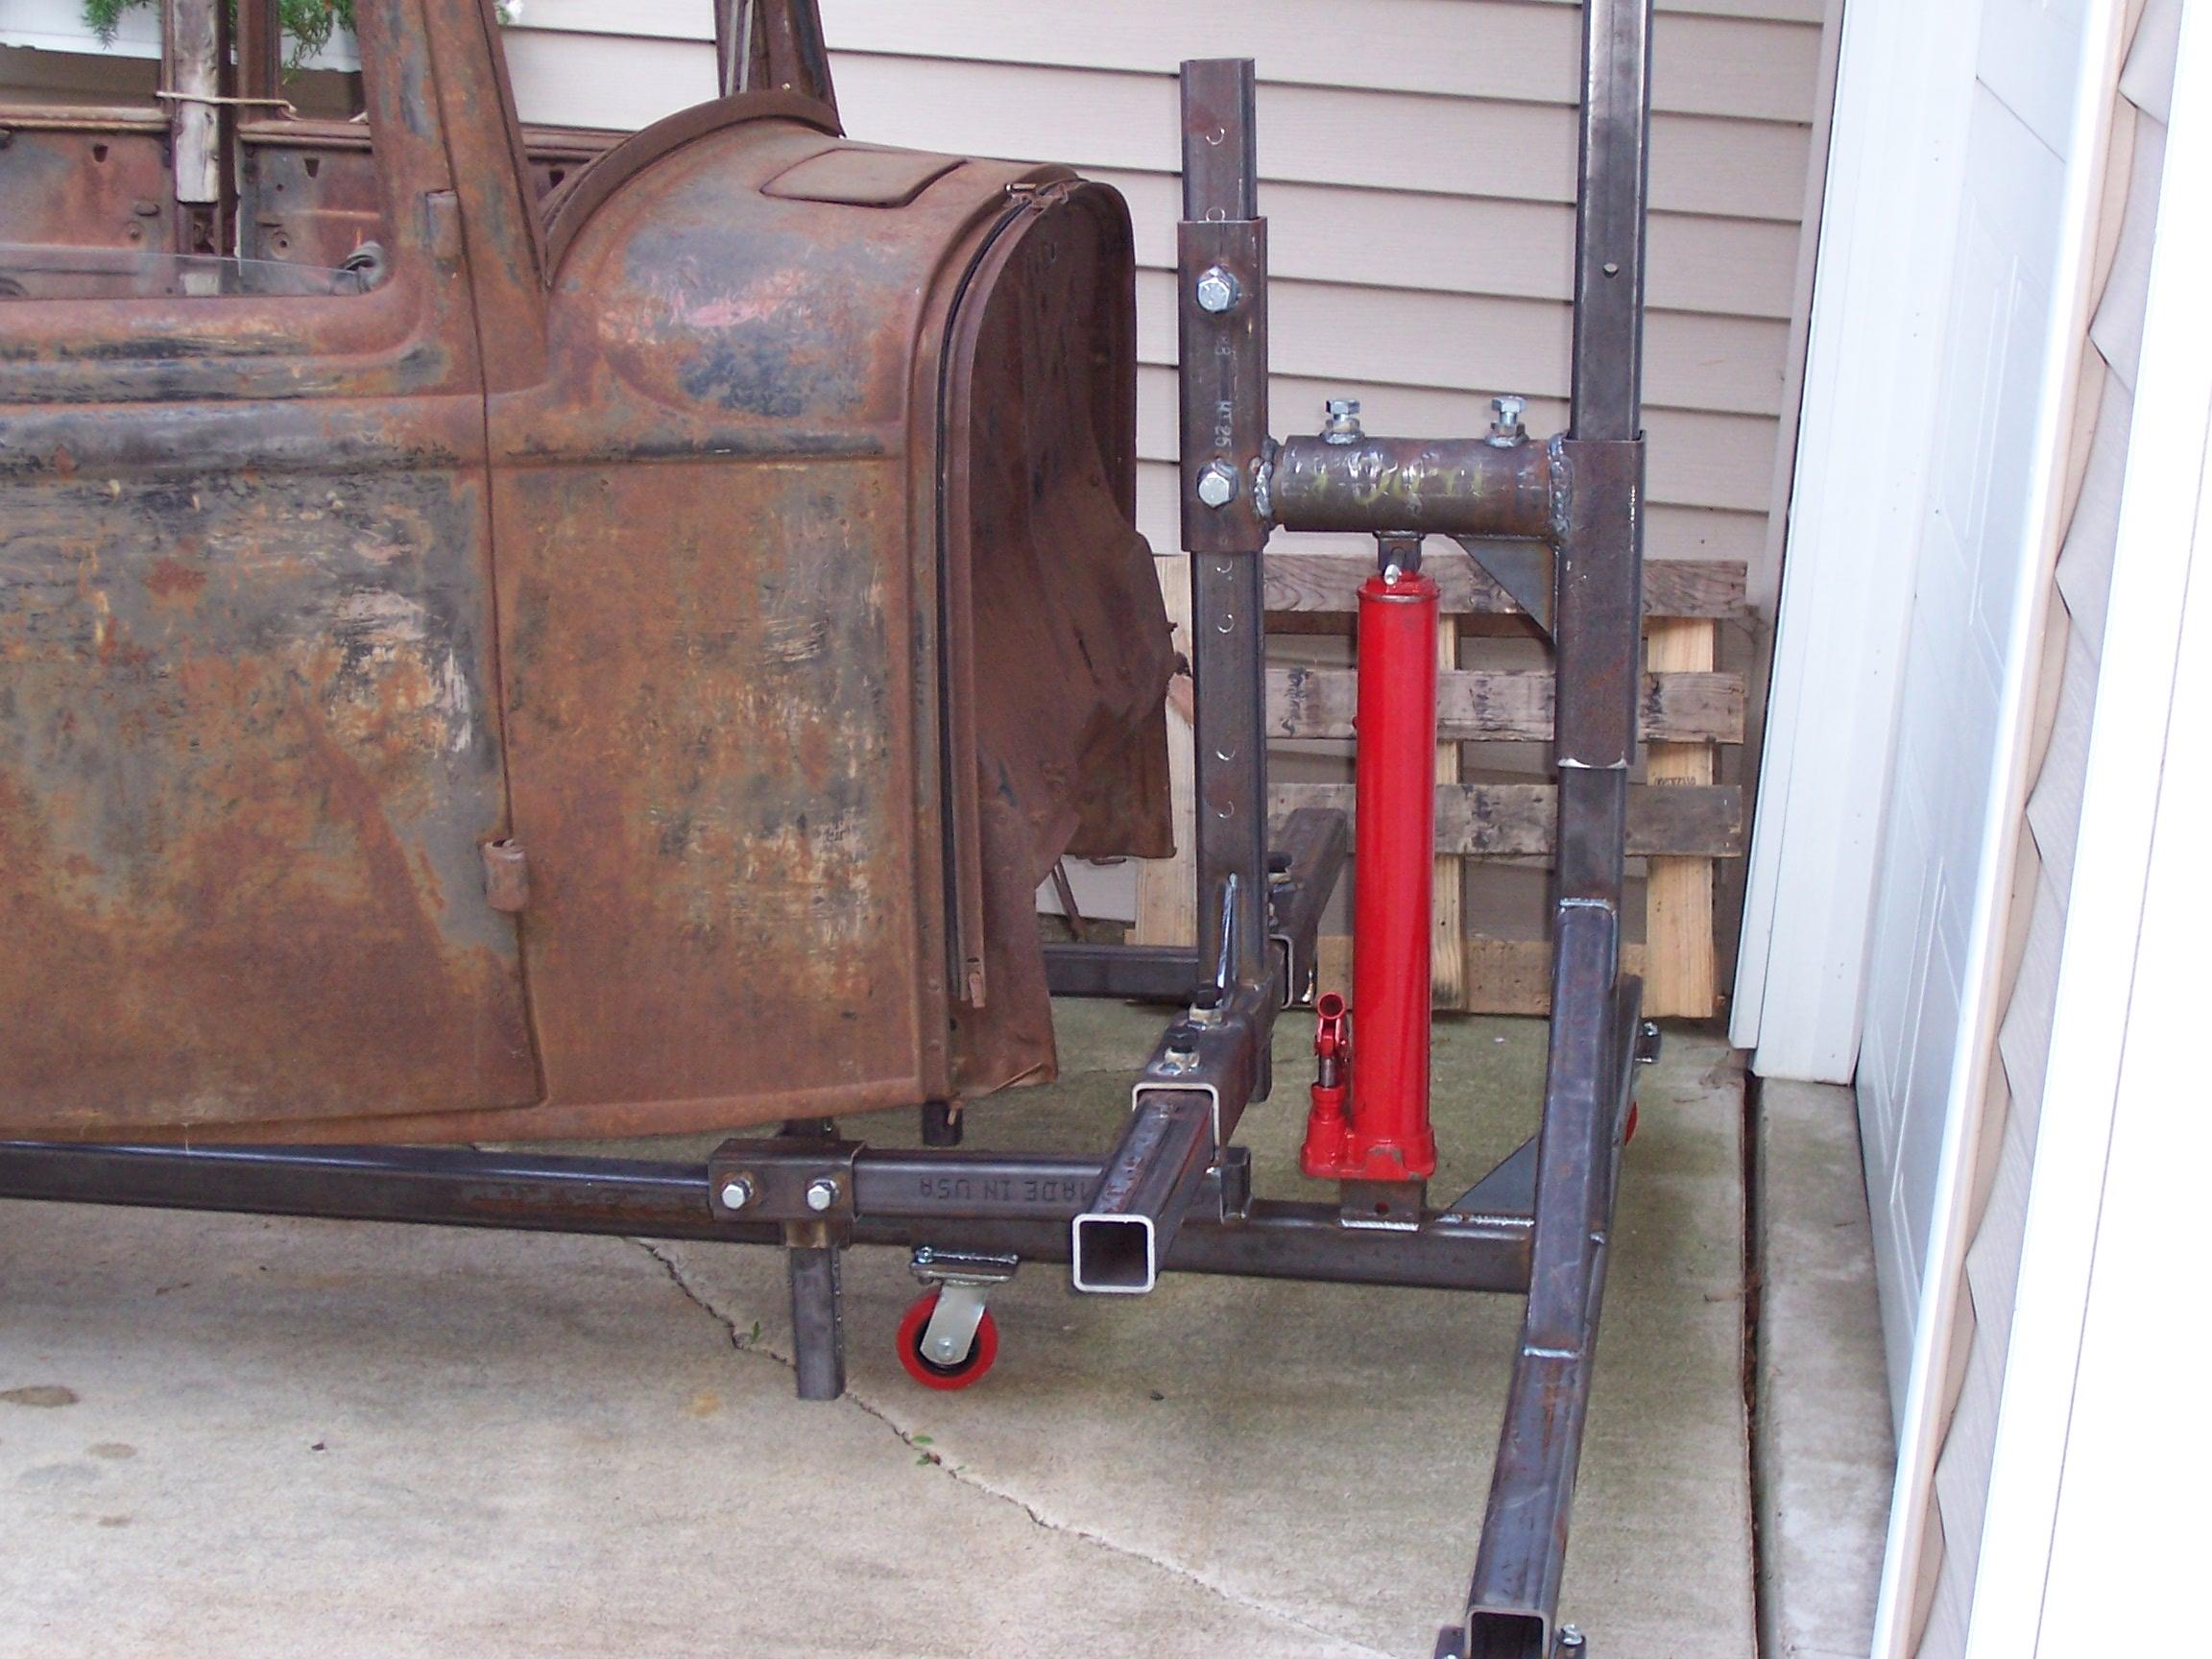 Auto Rotisserie Archives Free Auto Rotisserie Plans Car Rotisserie Plans